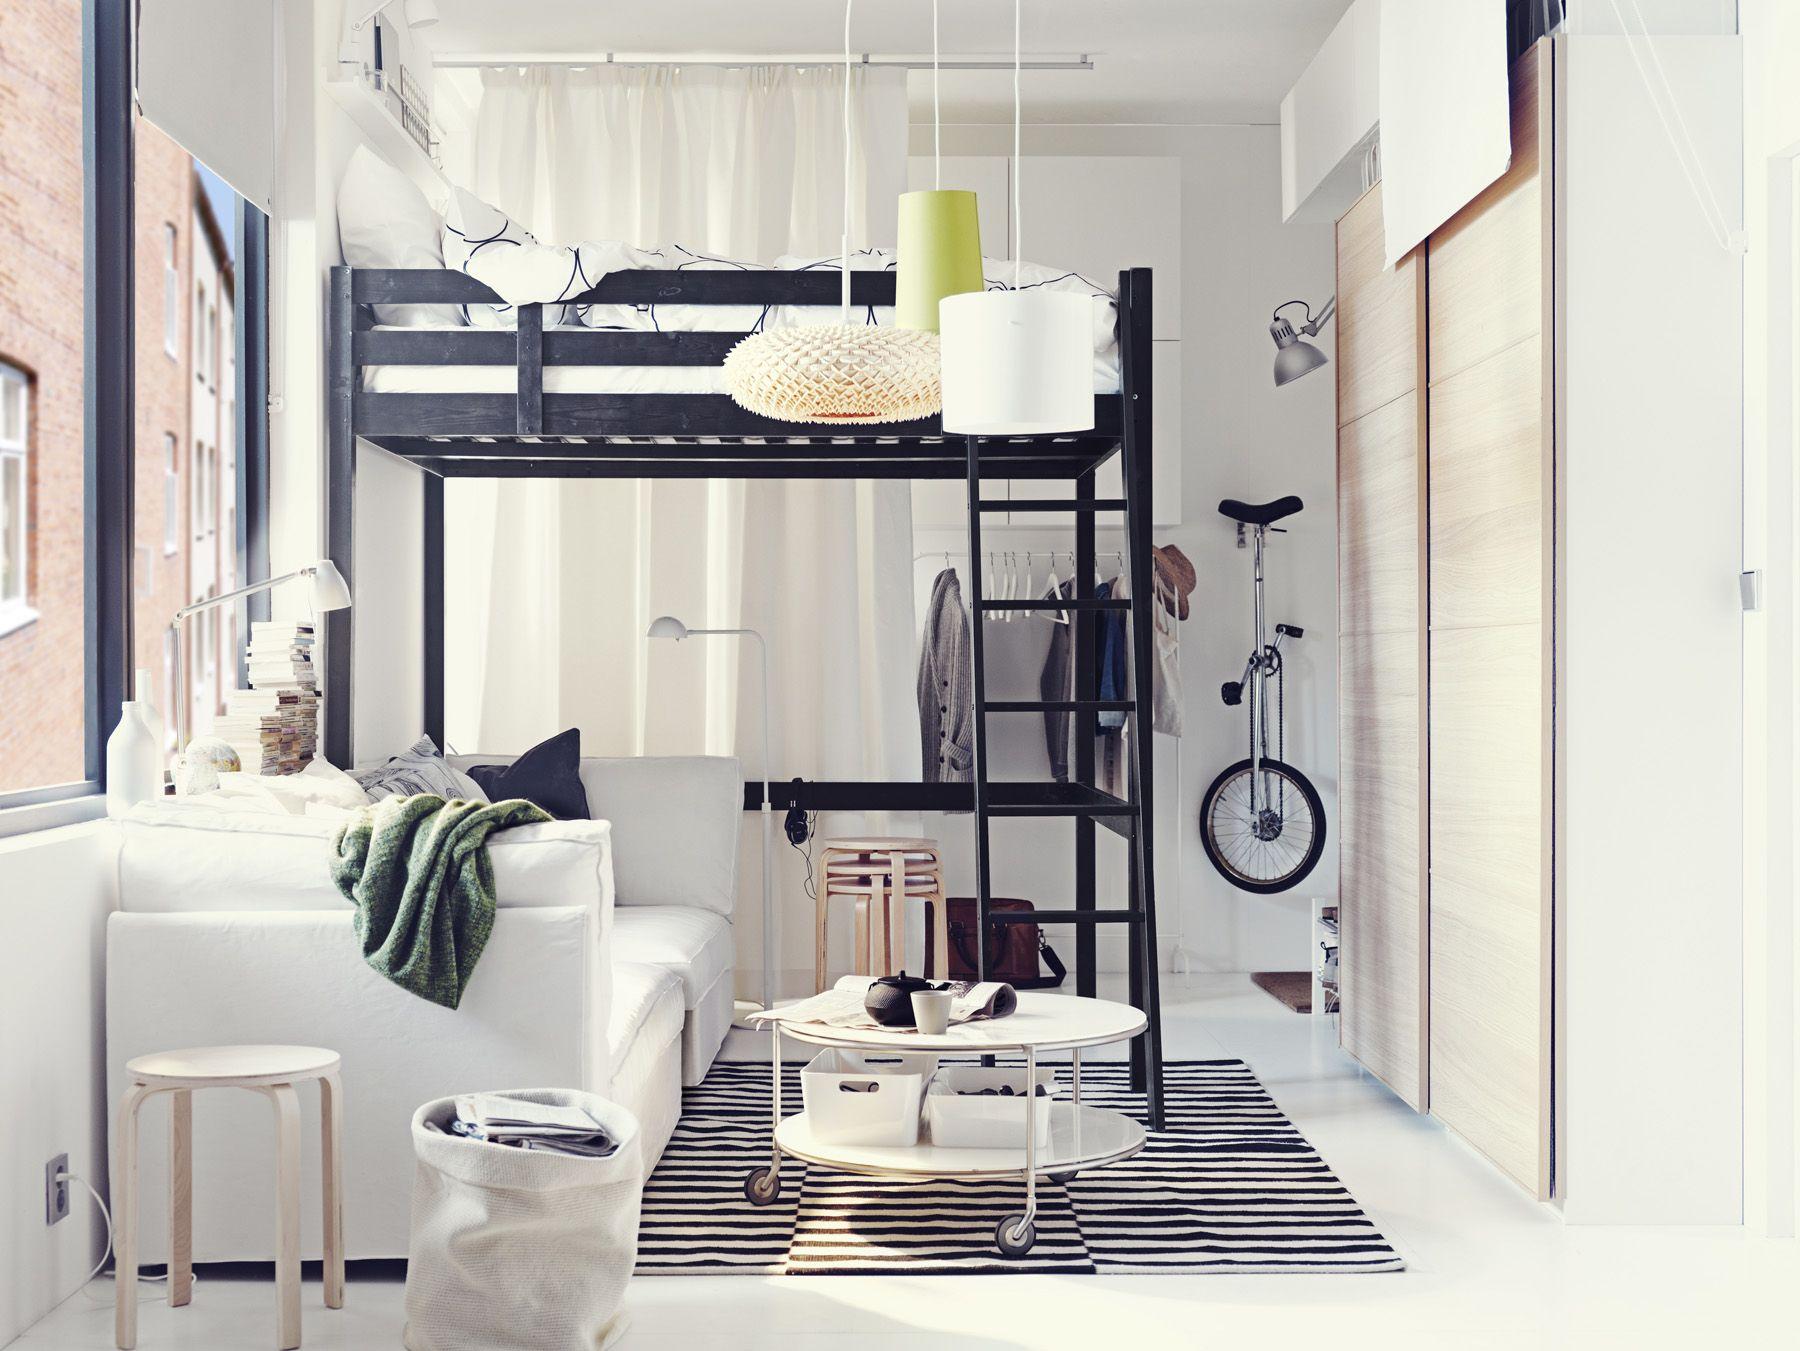 hochbett im jugendzimmer zimmerideen pinterest jugendzimmer hochbetten und jugendzimmer ikea. Black Bedroom Furniture Sets. Home Design Ideas